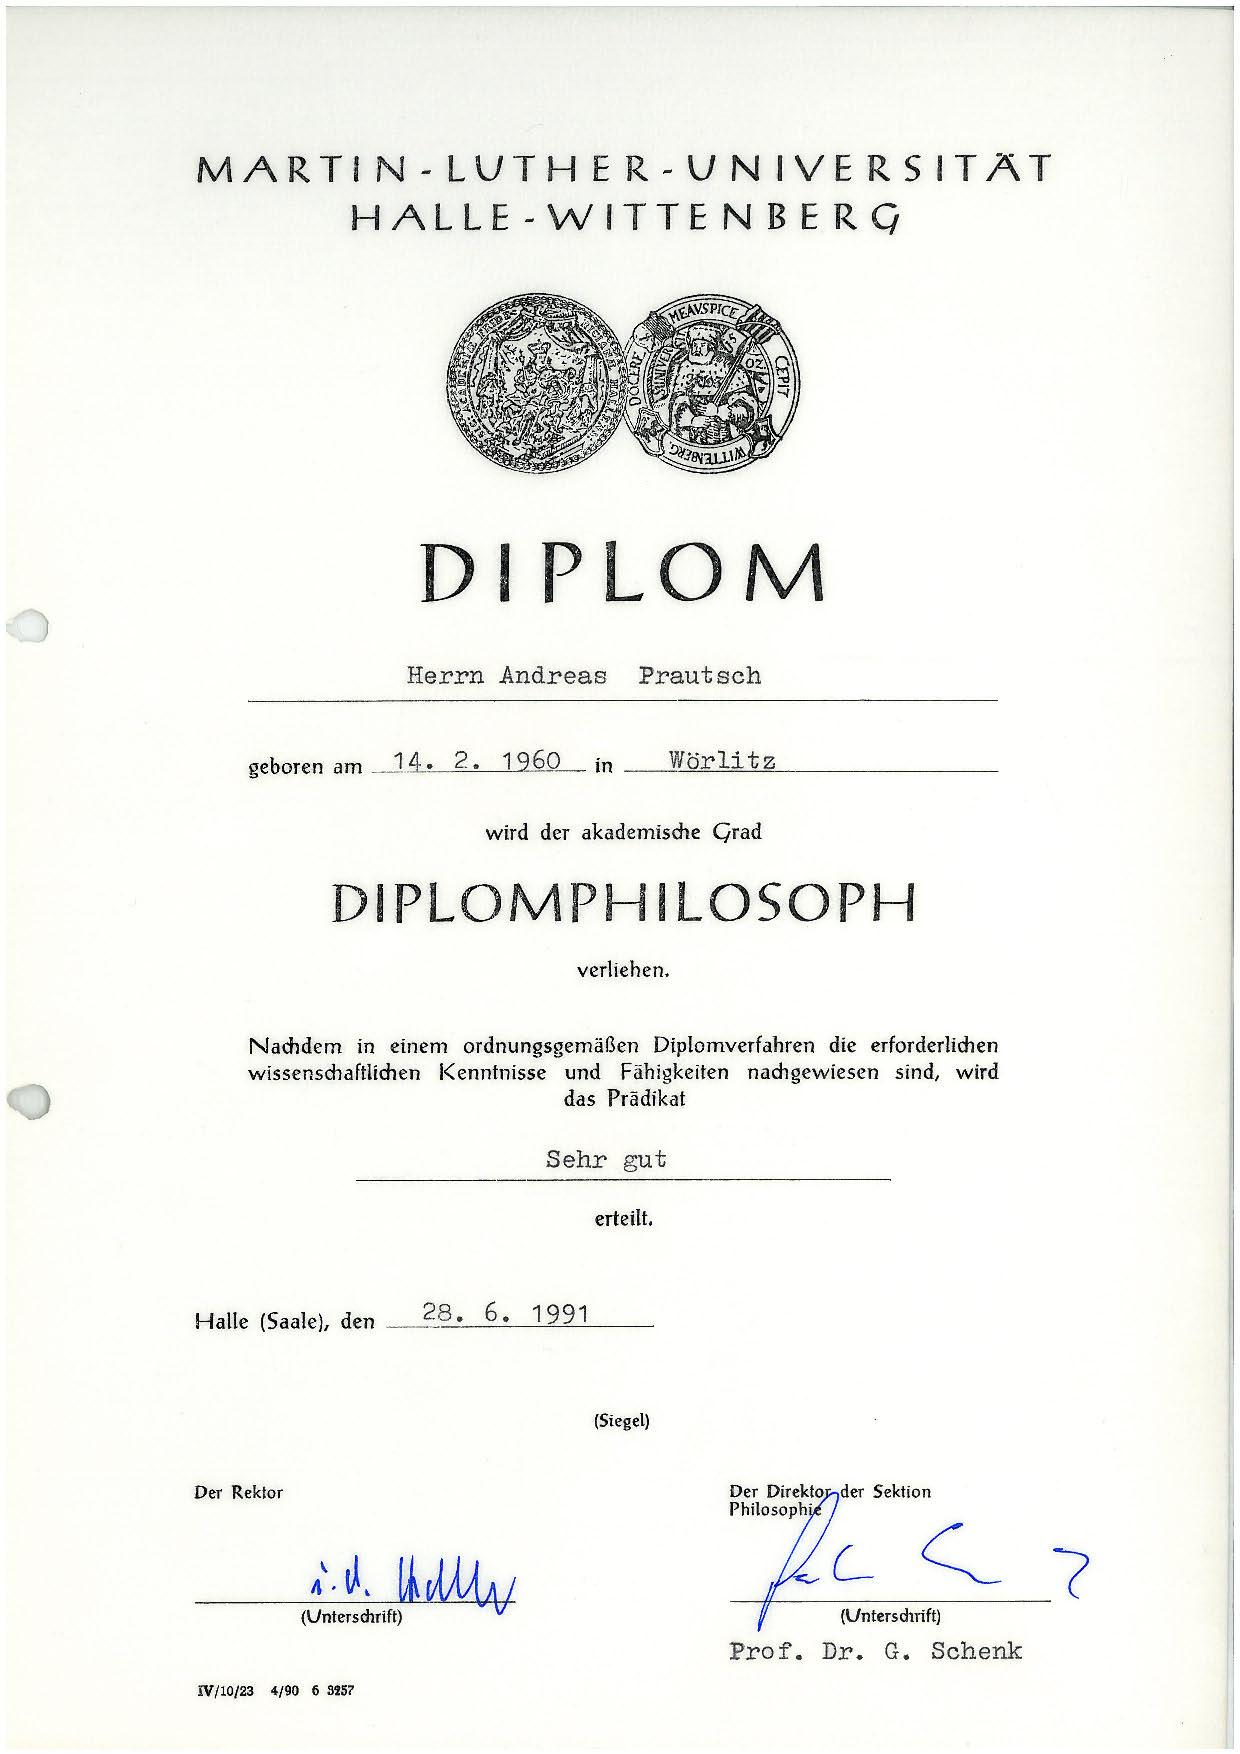 Diplomphilosoph - 1991